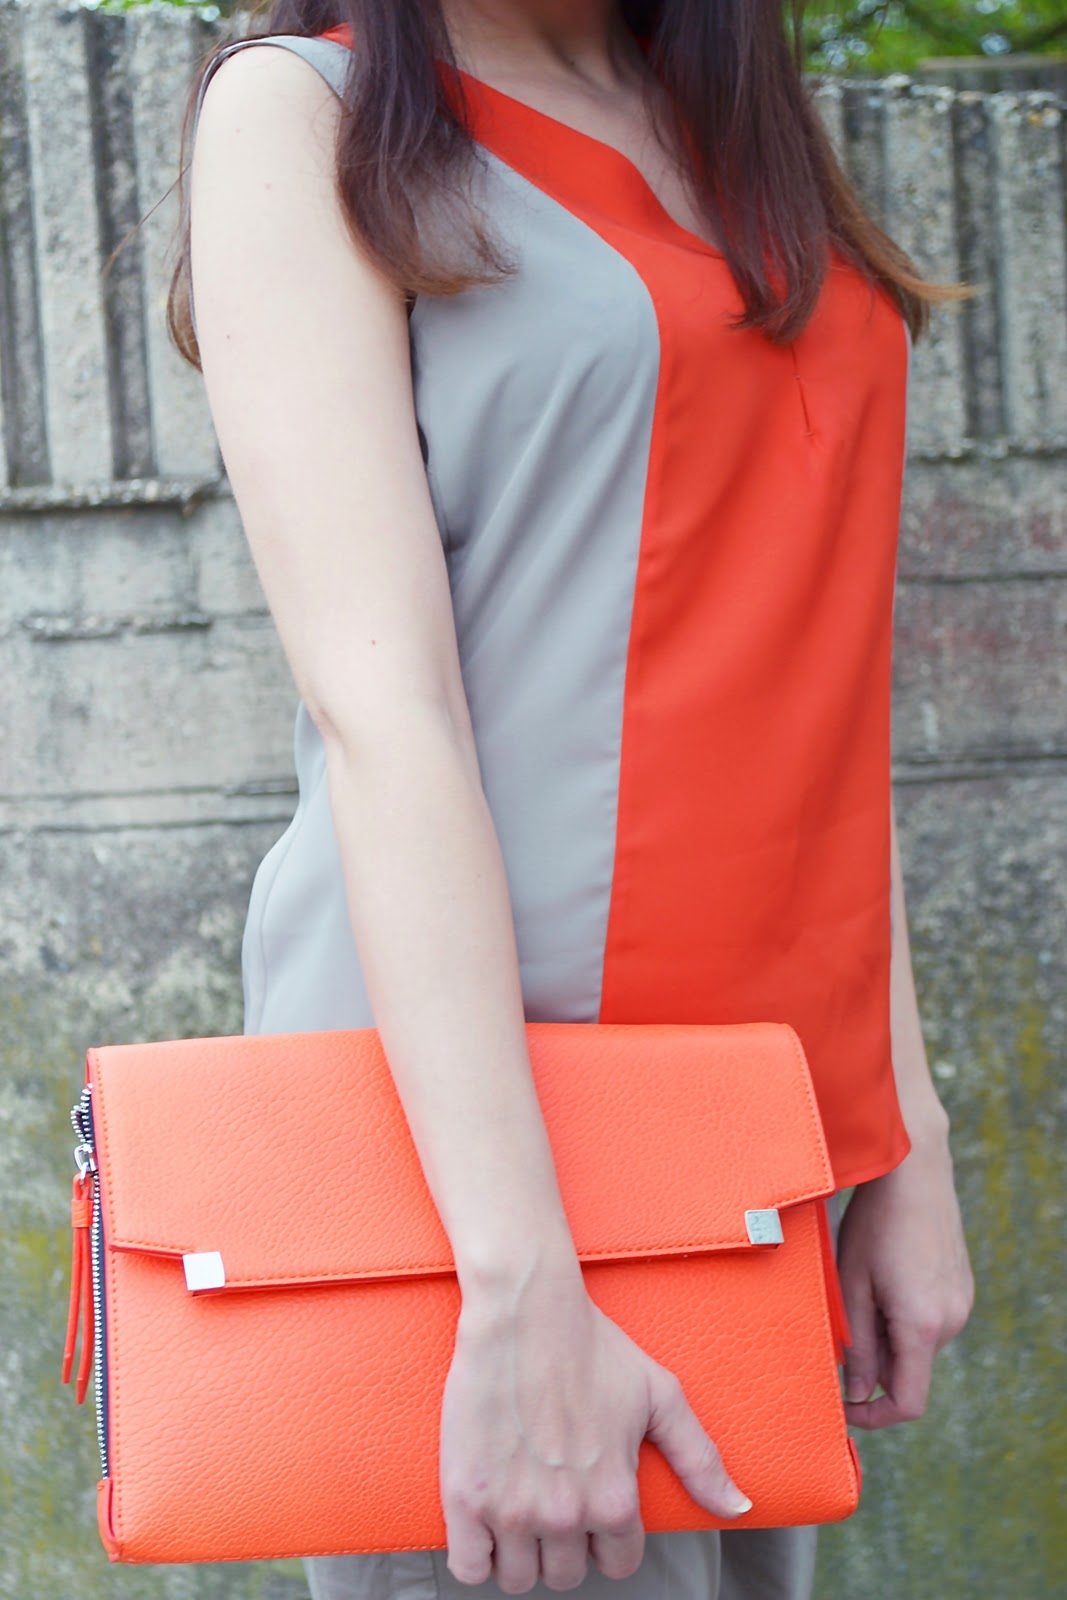 What to do with bad mood_Katharine-fashion is beautiful_Animal Print Baleríny_Oranžová kabelka_Katarína Jakubčová_Fashion blogger